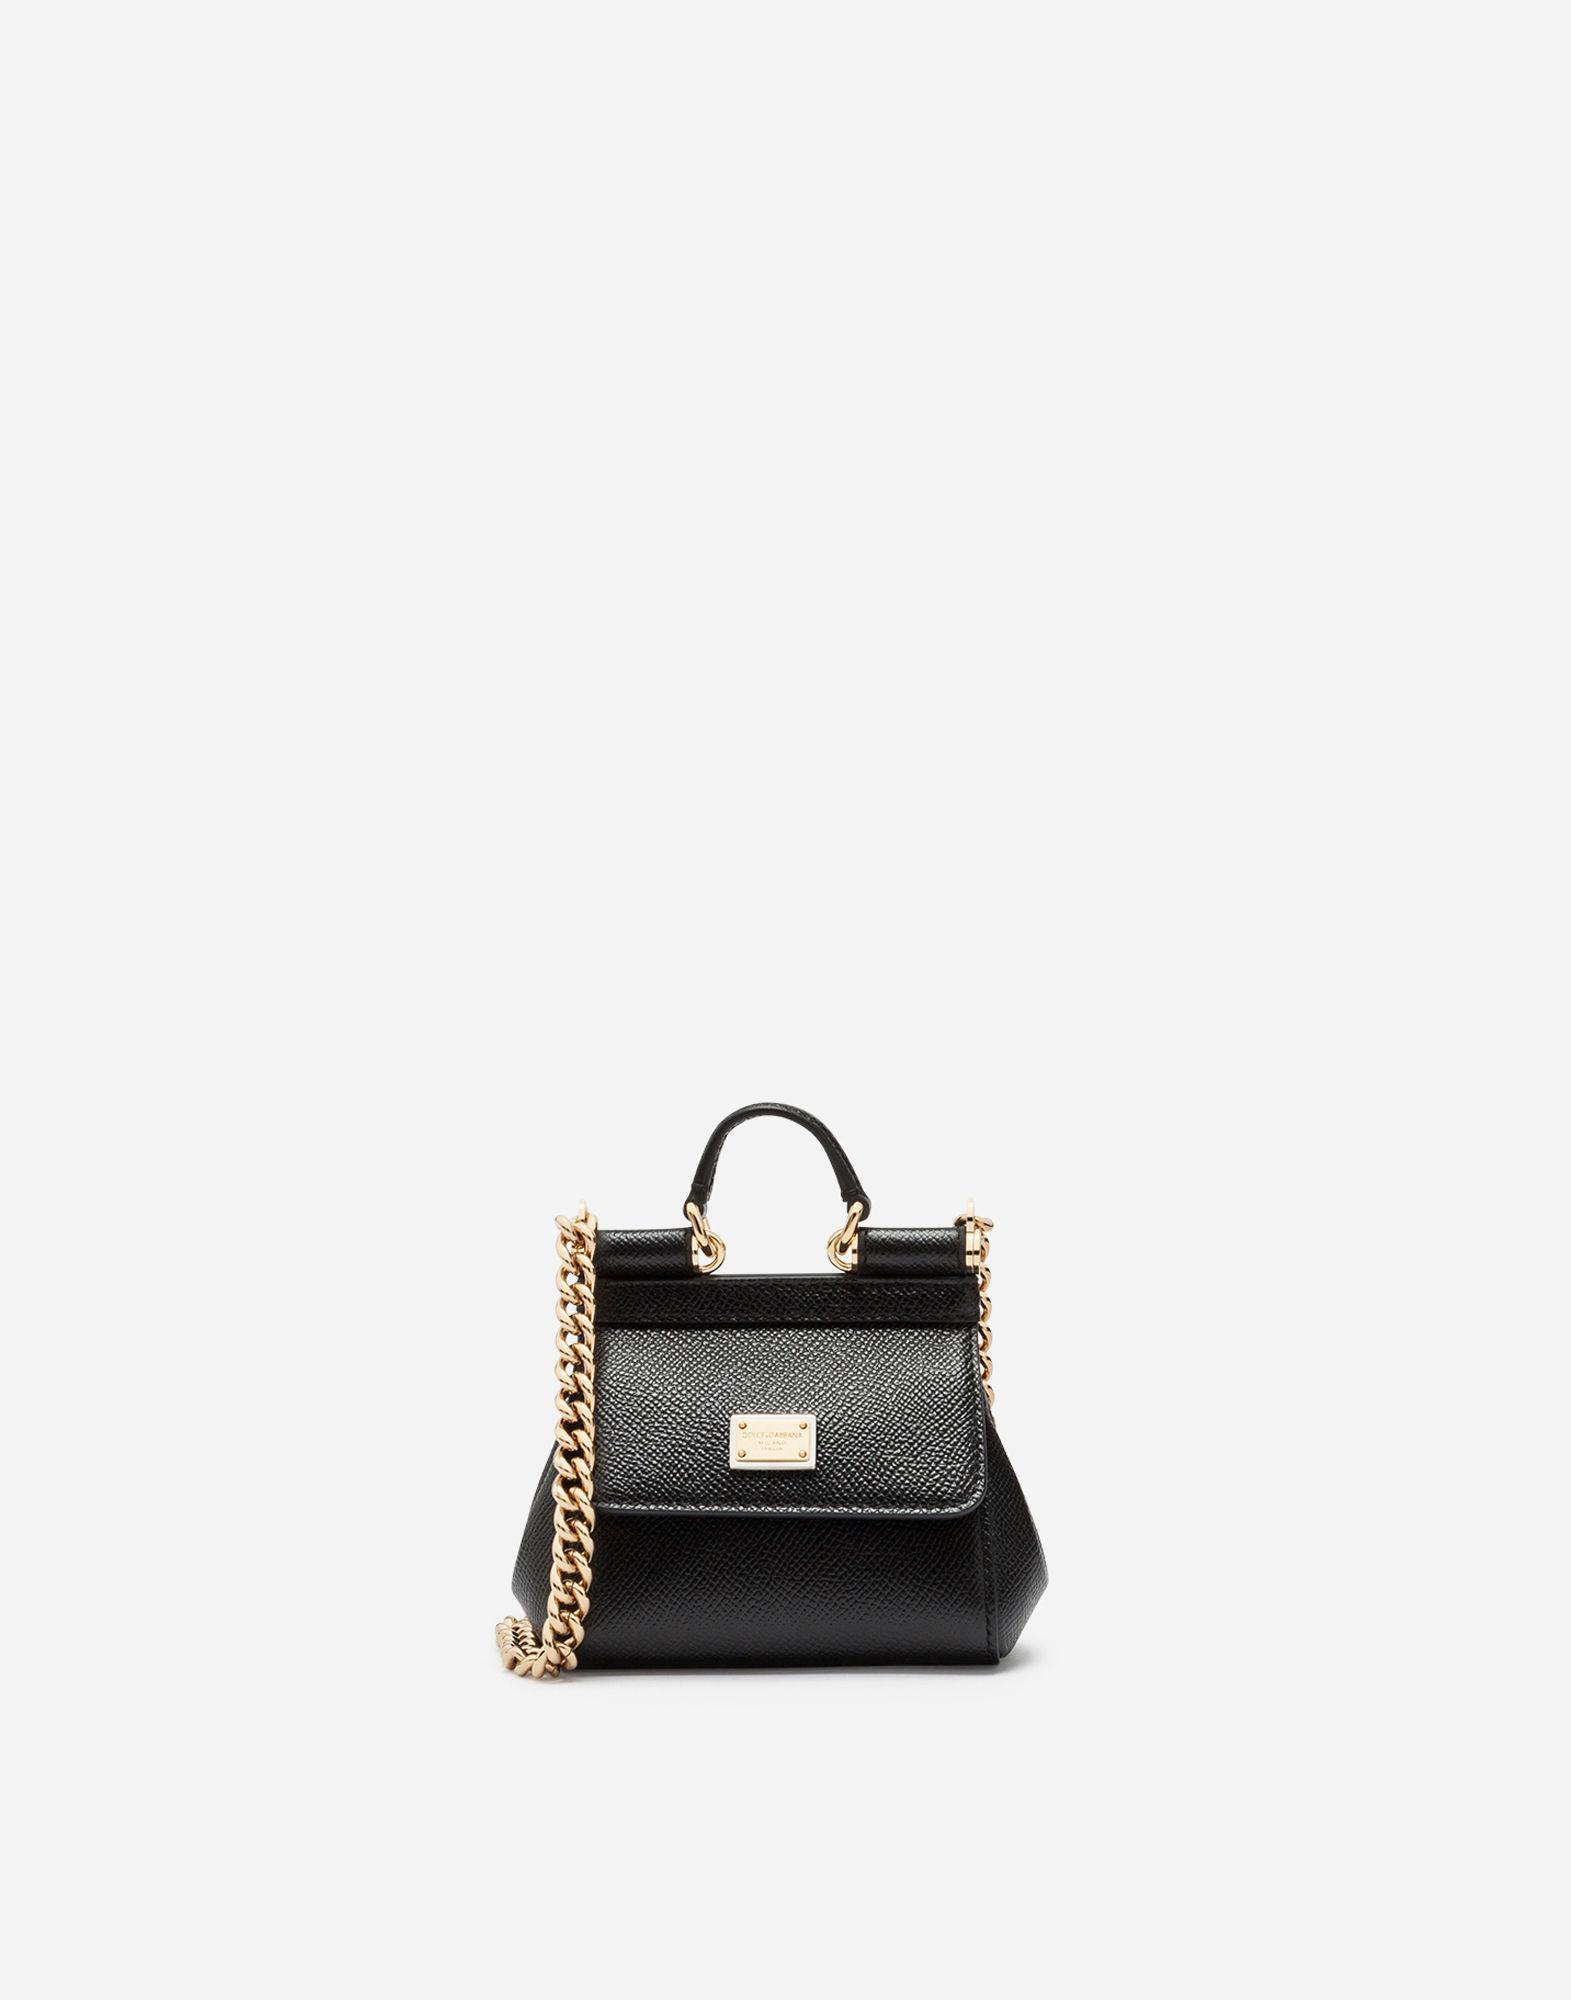 Lyst - Dolce   Gabbana Sicily Handbag In Printed Dauphine Calfskin ... 383c96058f839